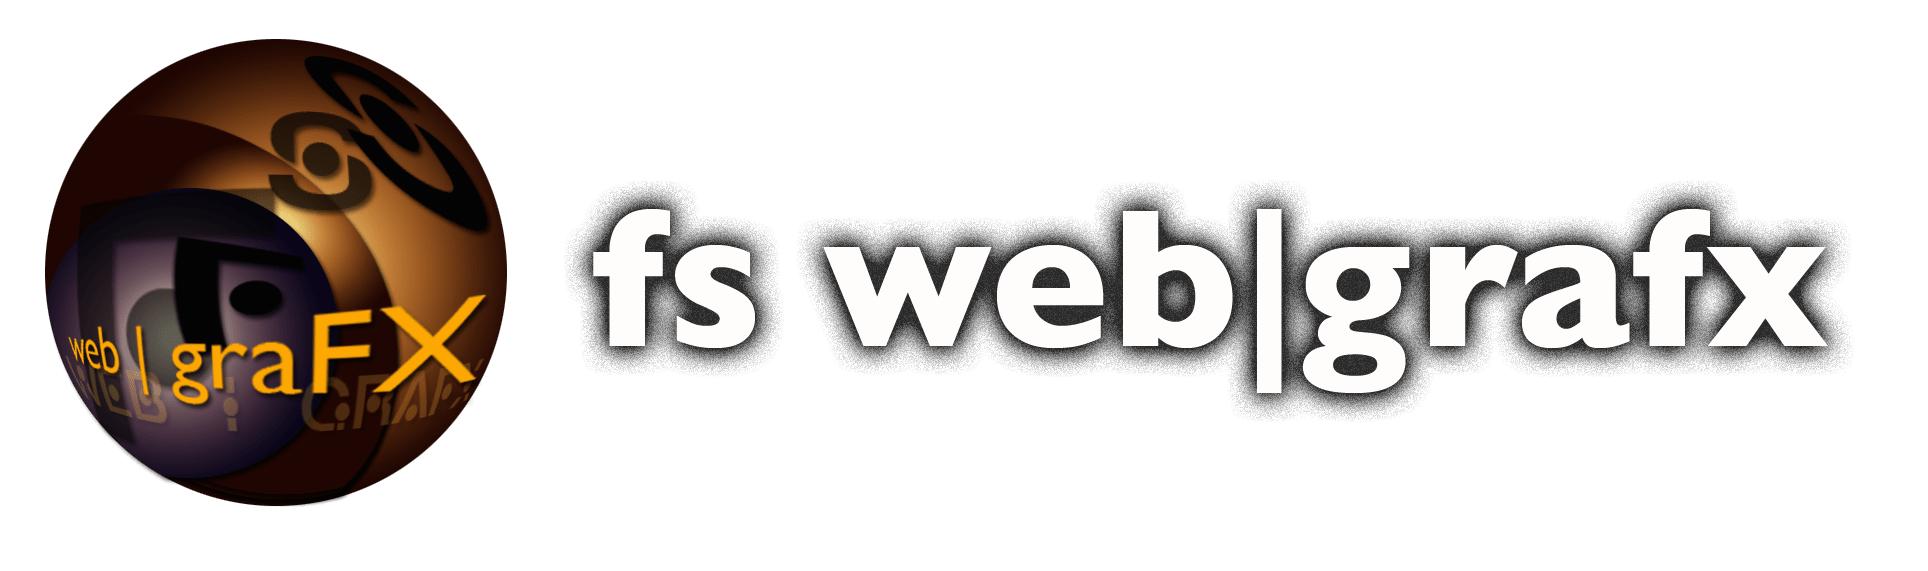 FS WEB/GRAFX